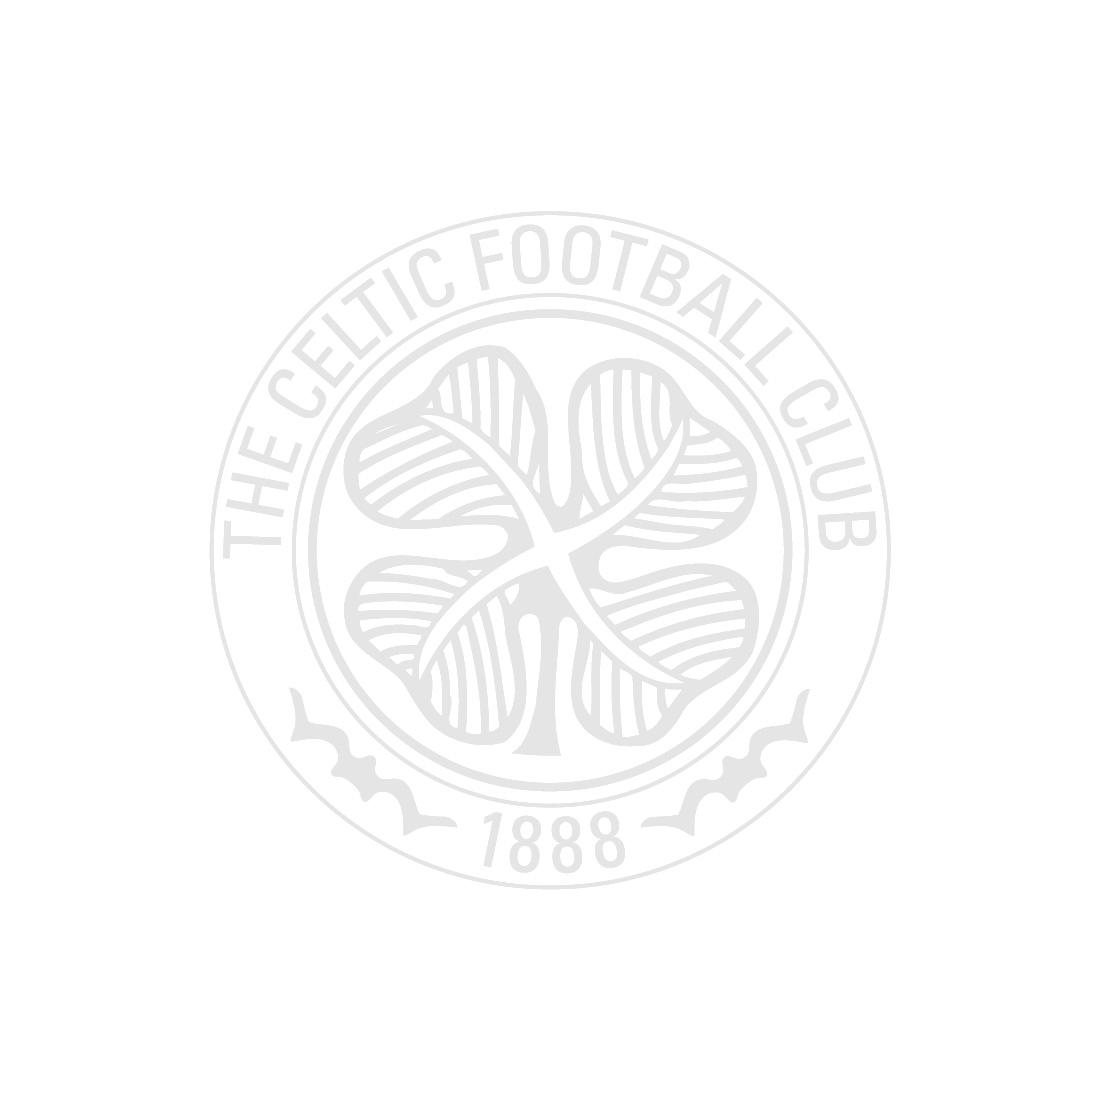 Celtic Mens Home Short 19/20 - change short - Player Issue